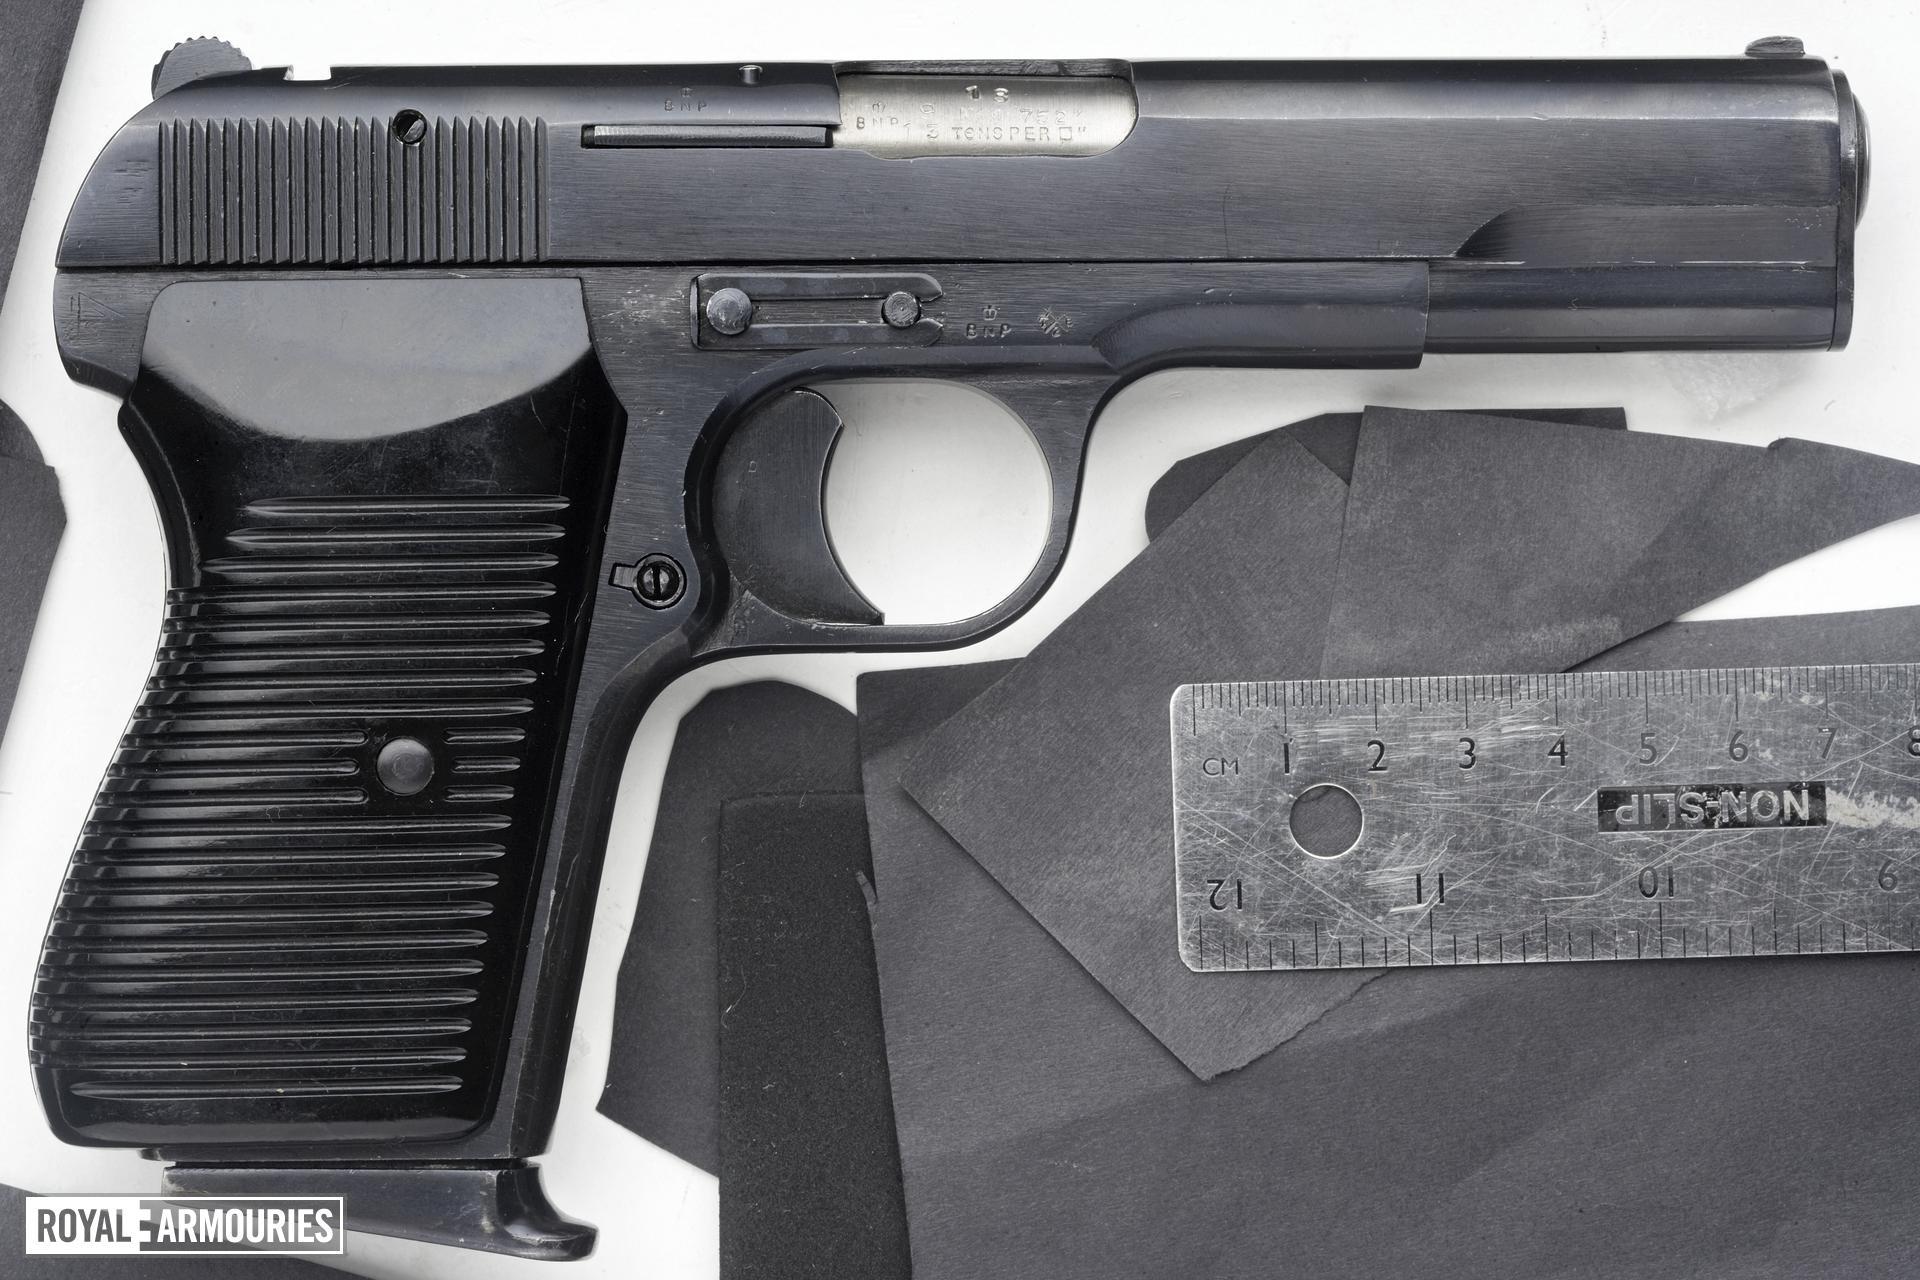 Centrefire self-loading pistol - Tokarev Tokagypt